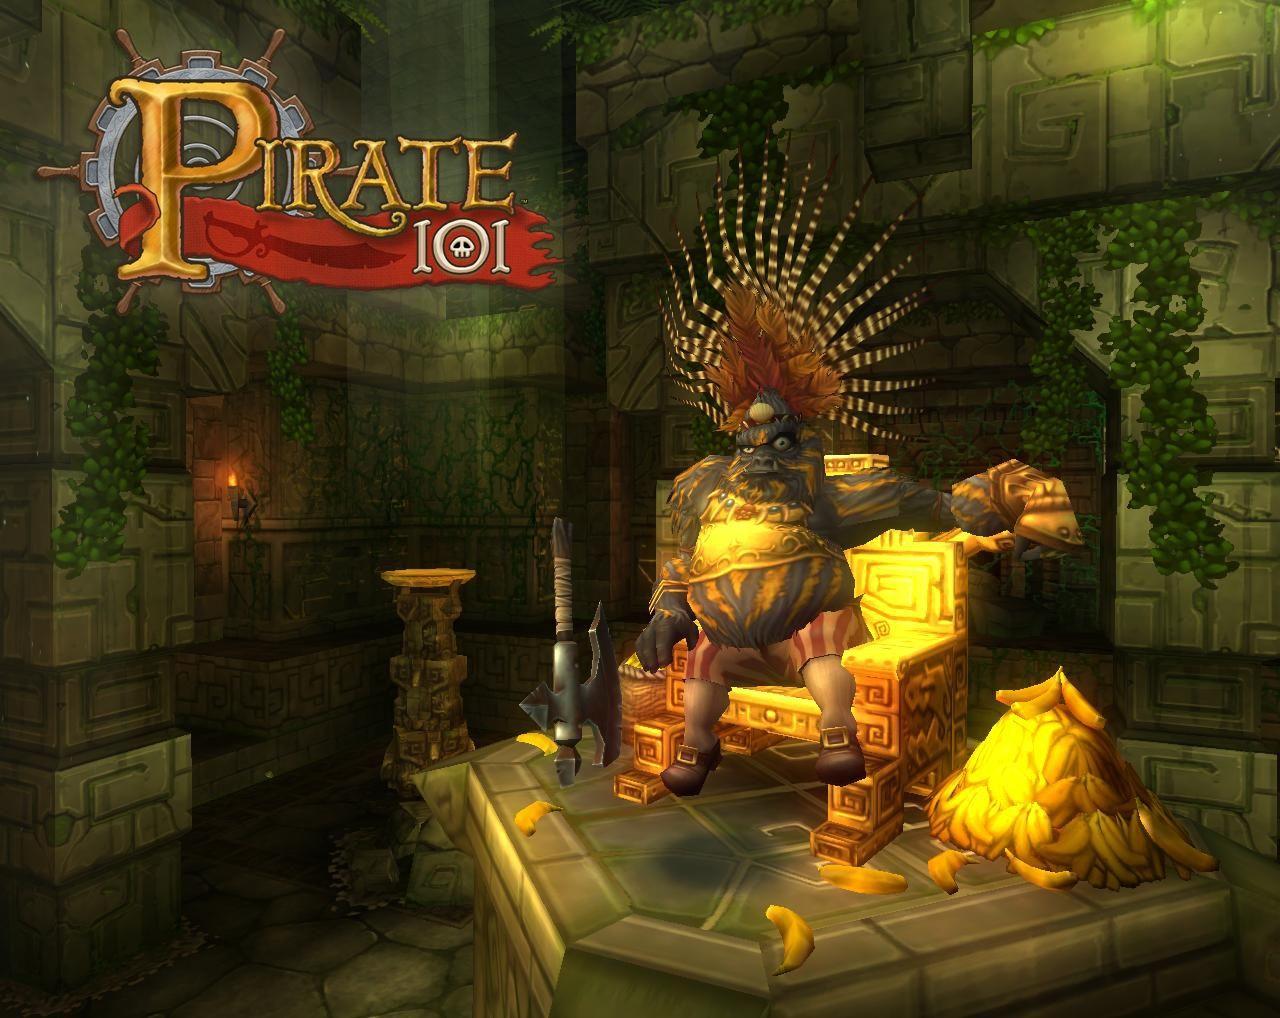 KingsIsle Pirates 101 Great family game! Wizard101